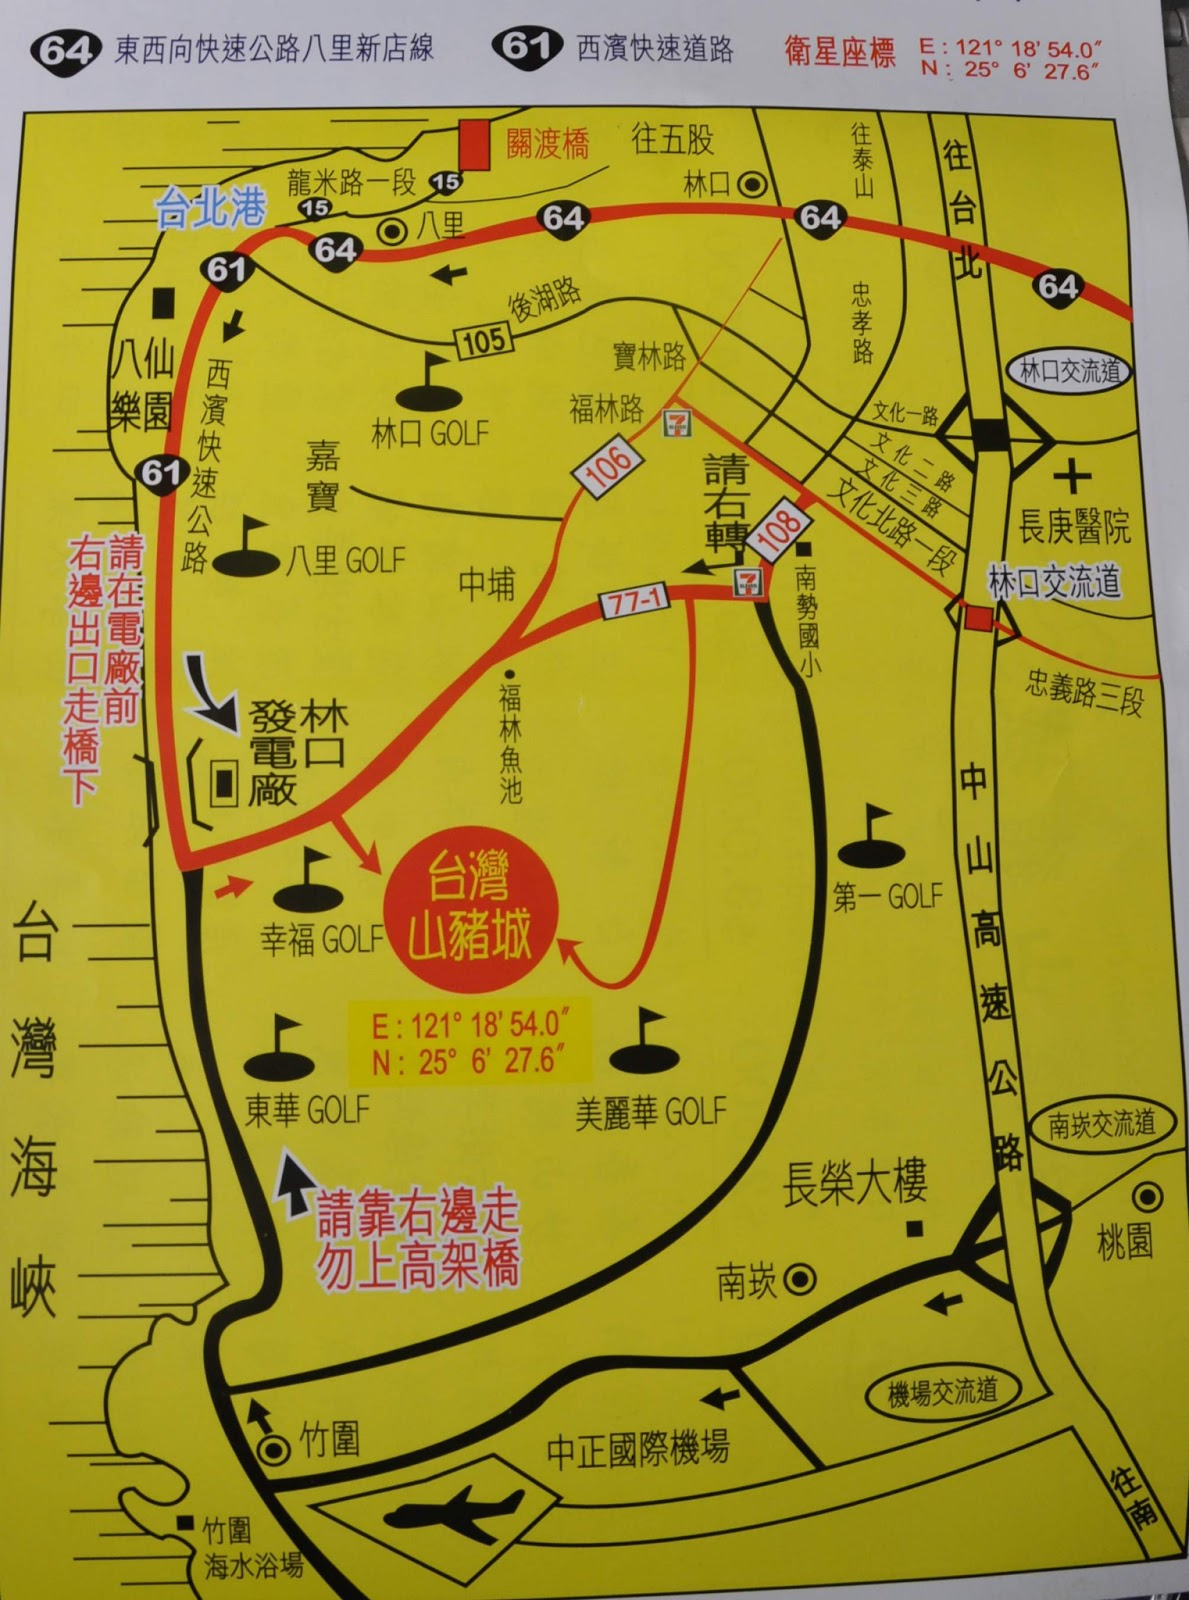 PCLin 幸福好站: 暢遊林口森林步道及臺灣山豬城